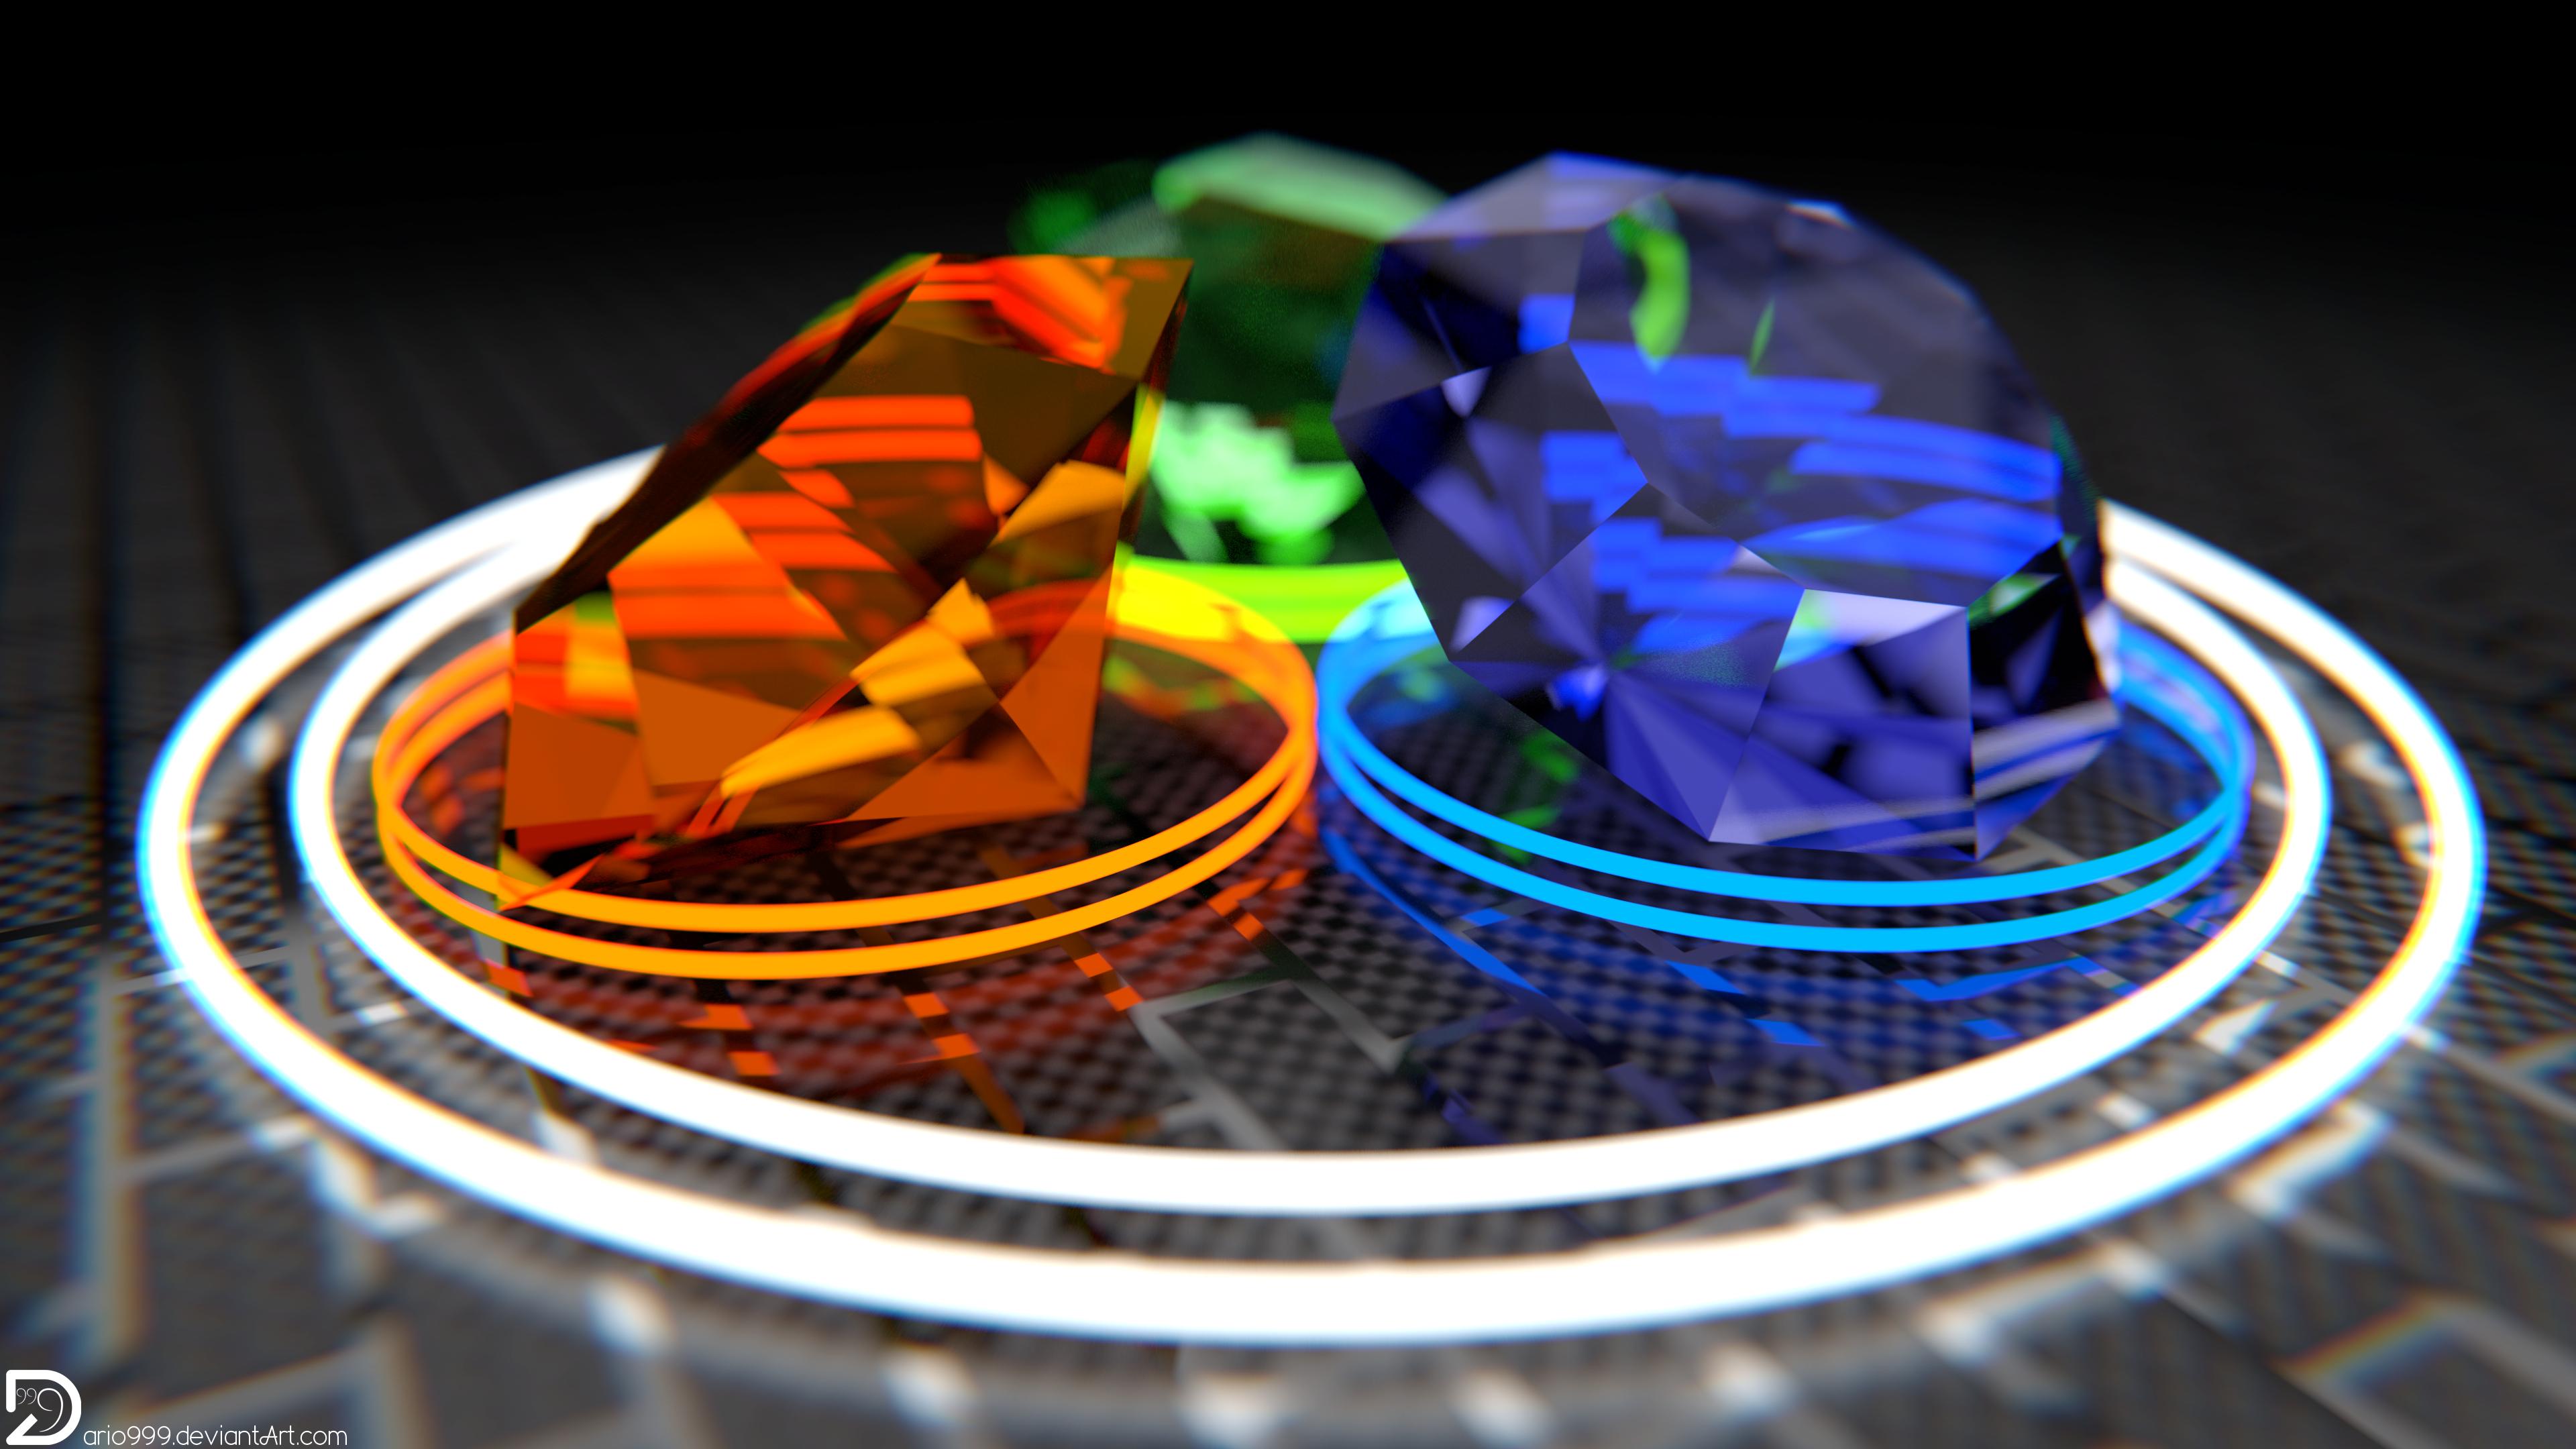 Minimalistic Diamonds - V2 (4k and Full HD) by Dario999